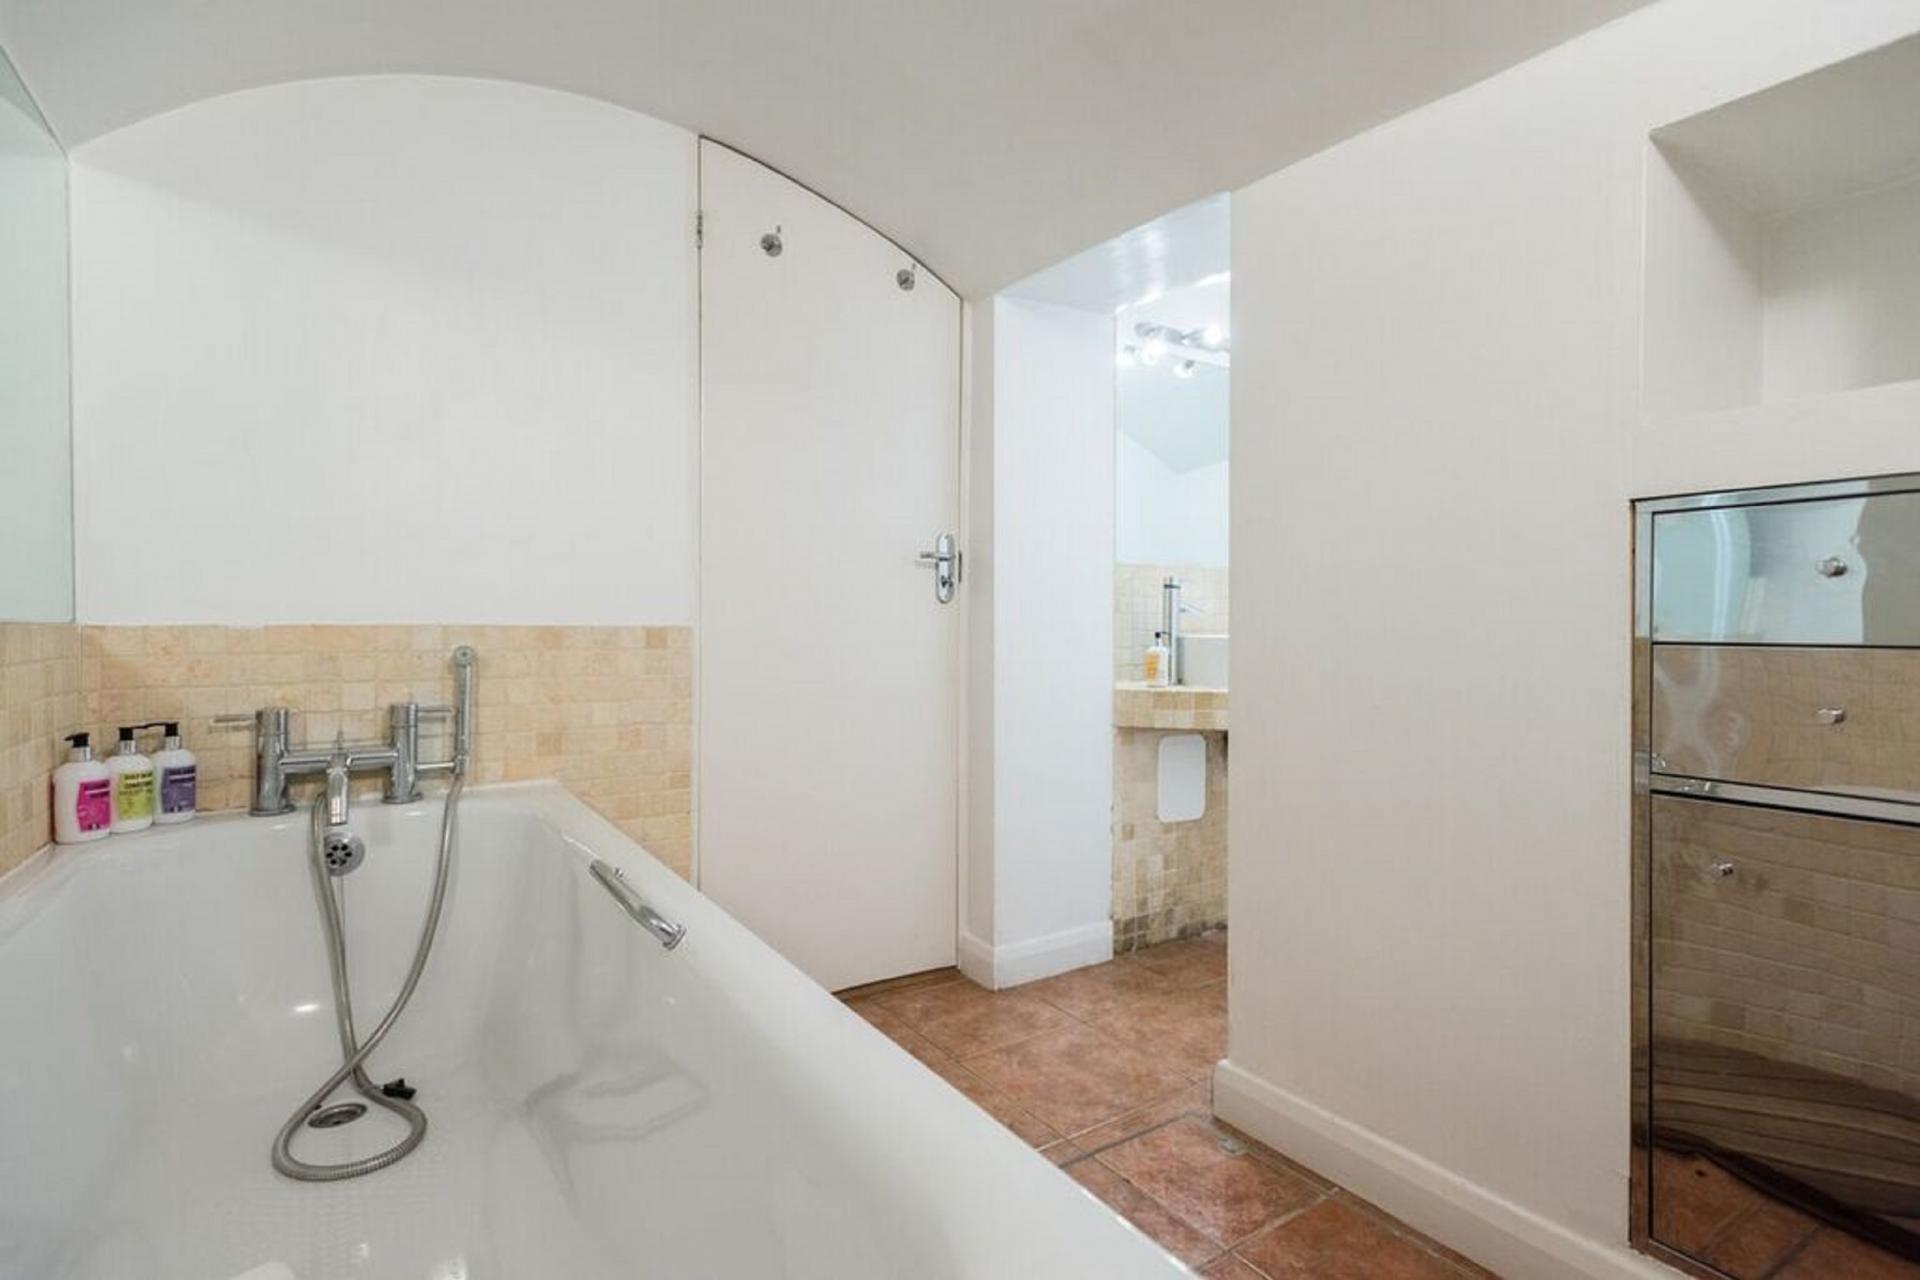 Bath at The Bayswater Gardens House, Bayswater, London